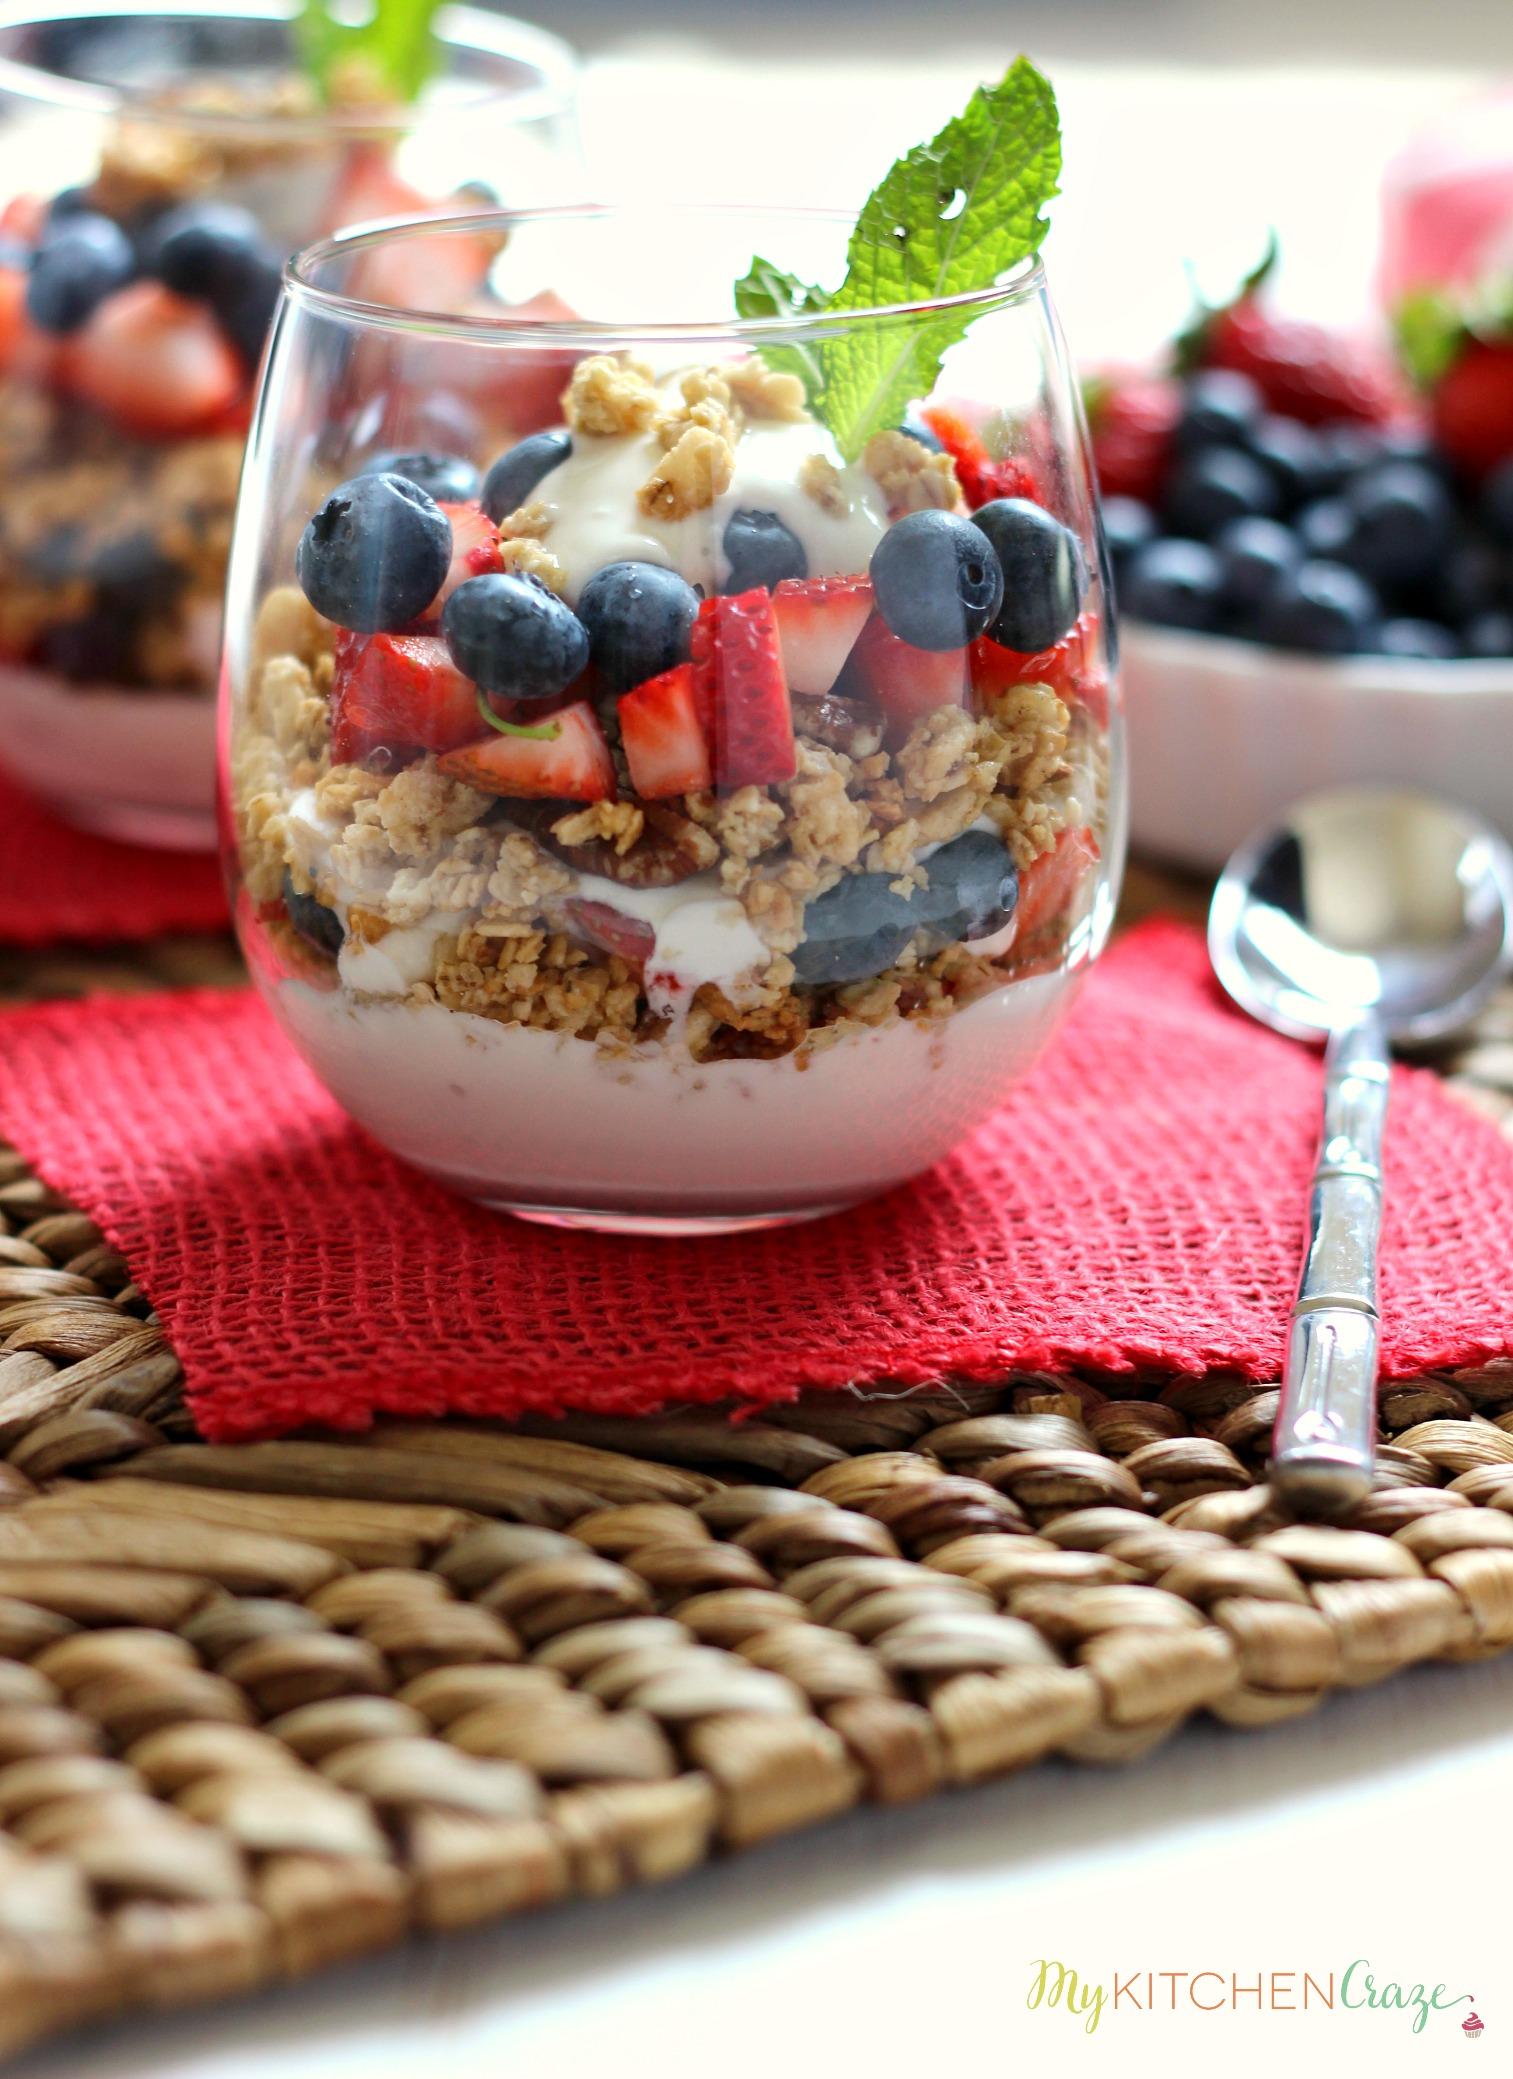 Berry Fruit and Yogurt Granola Parfait - My Kitchen Craze